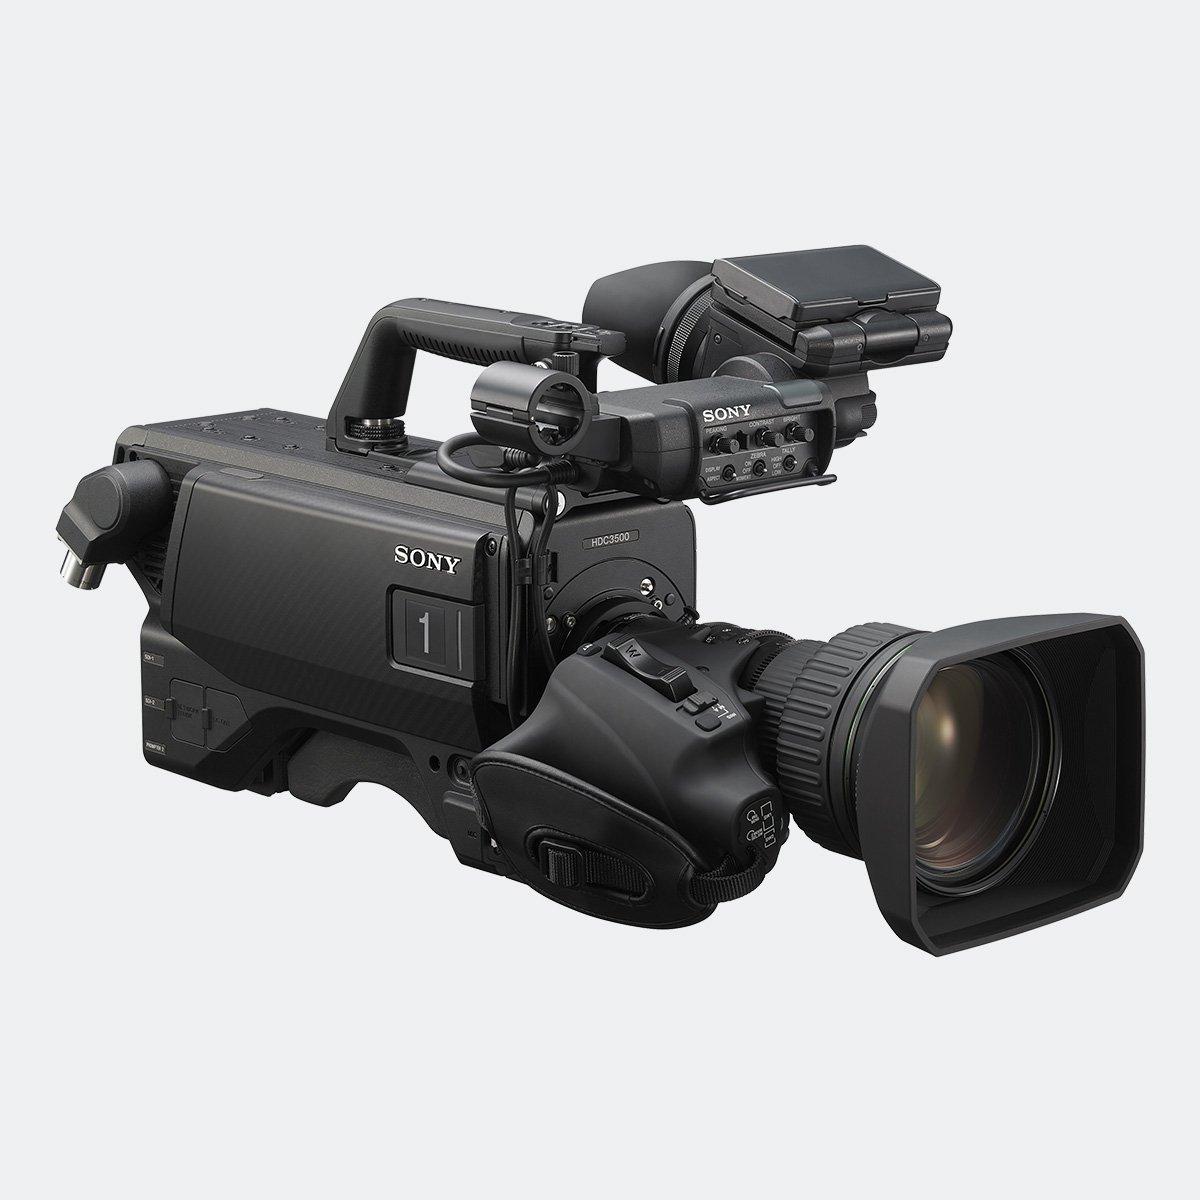 Sony HDC-3500 4K Camera System